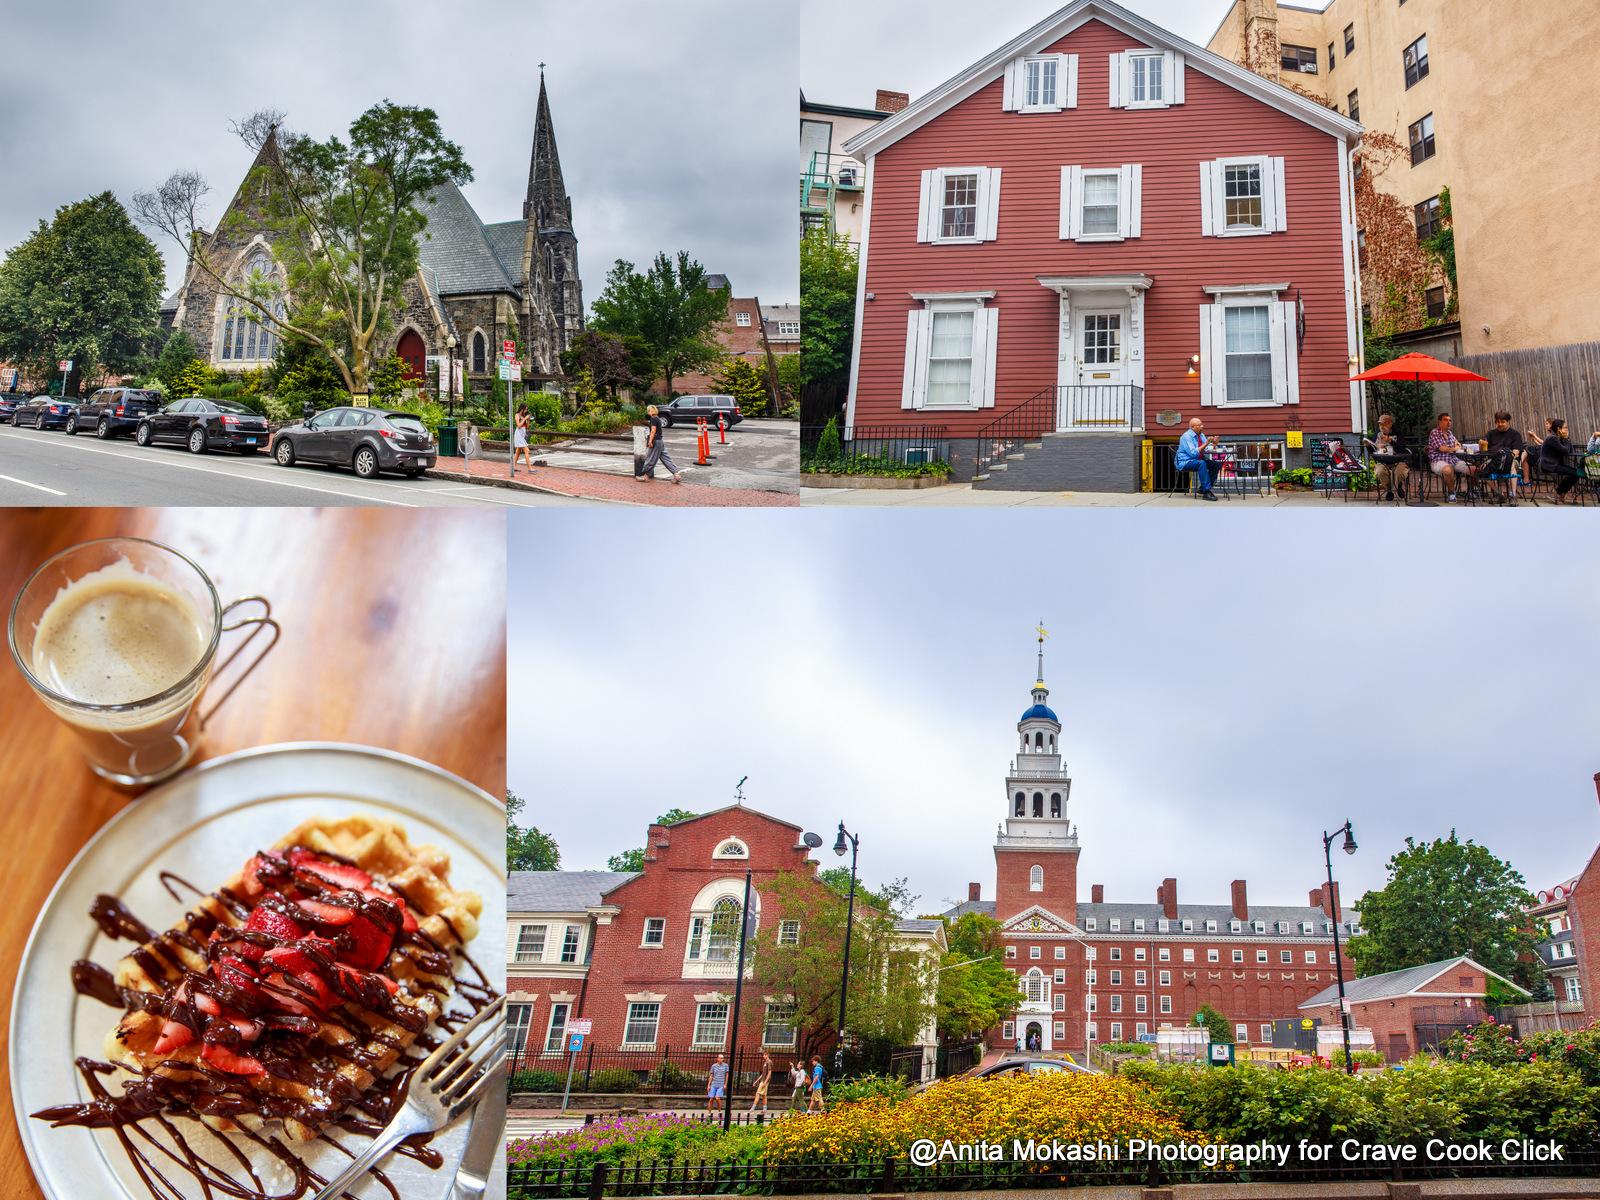 boston travelogue, boston itinerary, boston common, harvard square, harvard university, boston library, freedom trail, boston common, boston cream pie, boston pier, mikes place, MIT, travel blog, must do things in boston, mikes pastry, quincy market, boston harbor, boston waterfront, boston duck tour